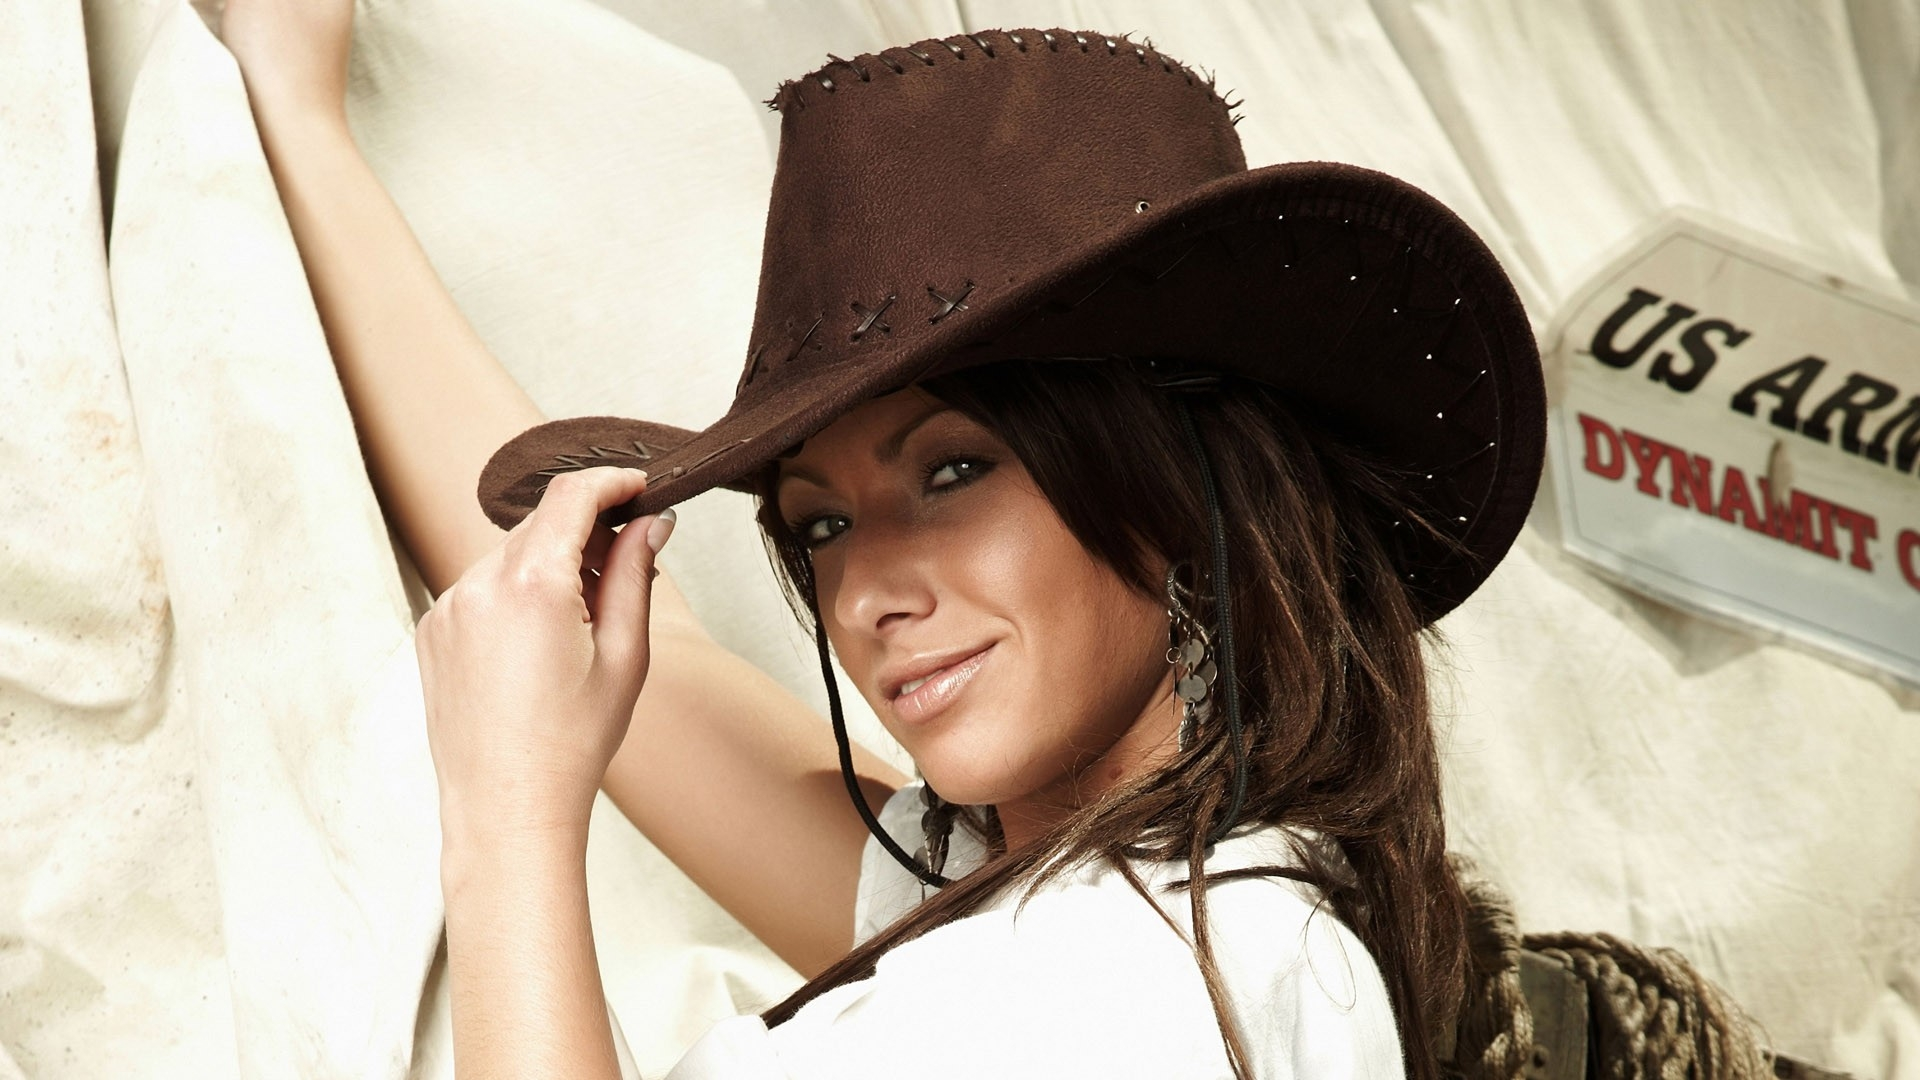 download wallpaper 1920x1080 girl hat cowboy face